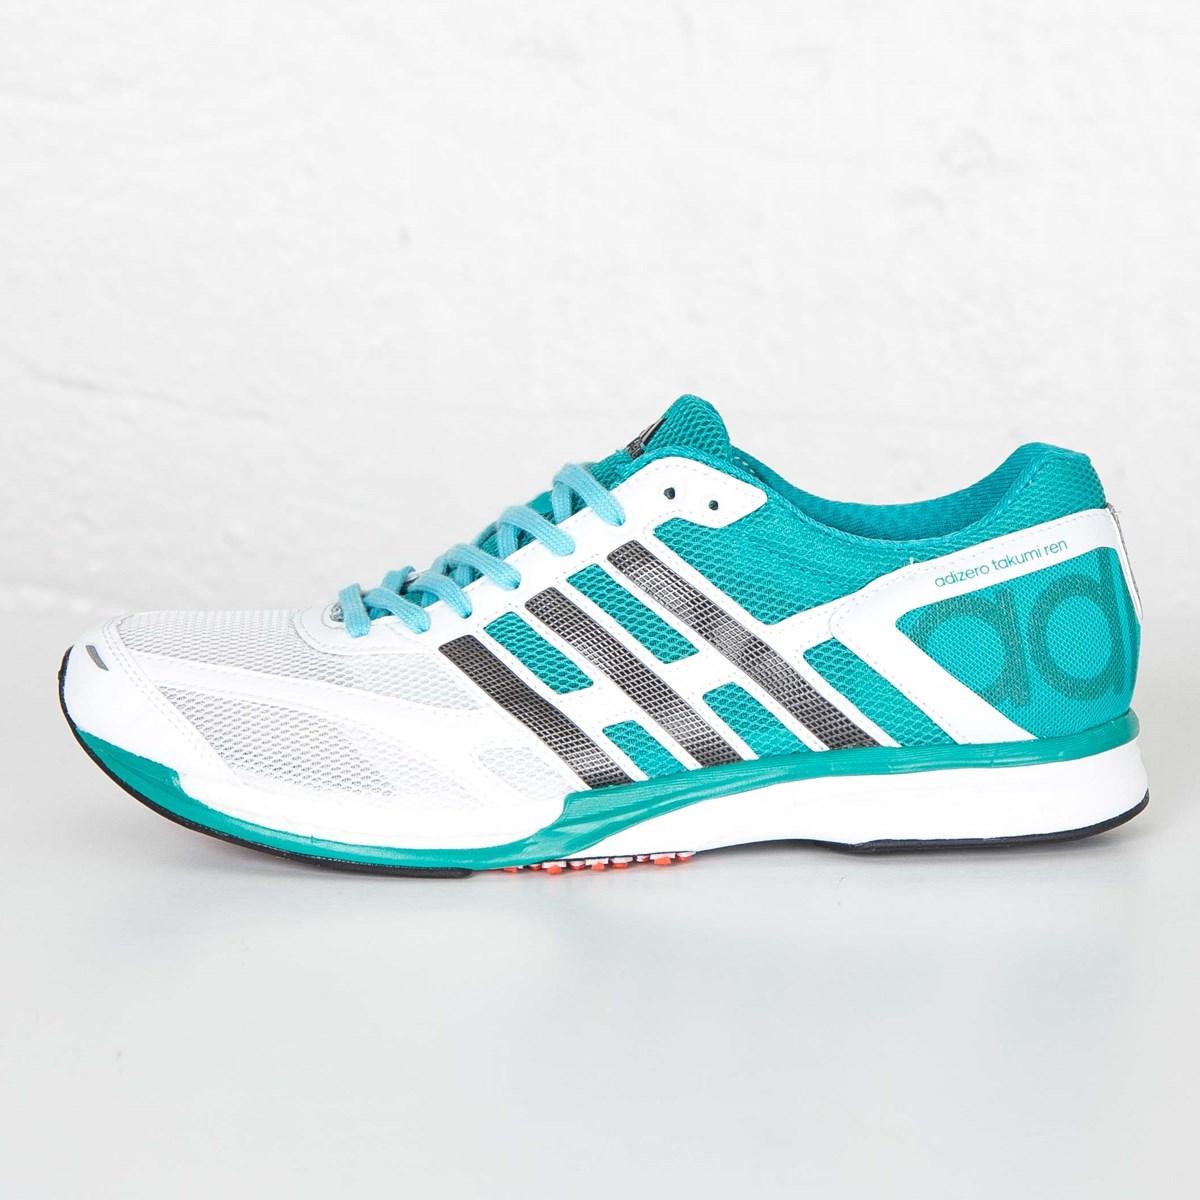 Máxima Iniciar sesión galope  adidas Adizero Takumi Ren 3 - Af4042 - Sneakersnstuff | sneakers &  streetwear online since 1999